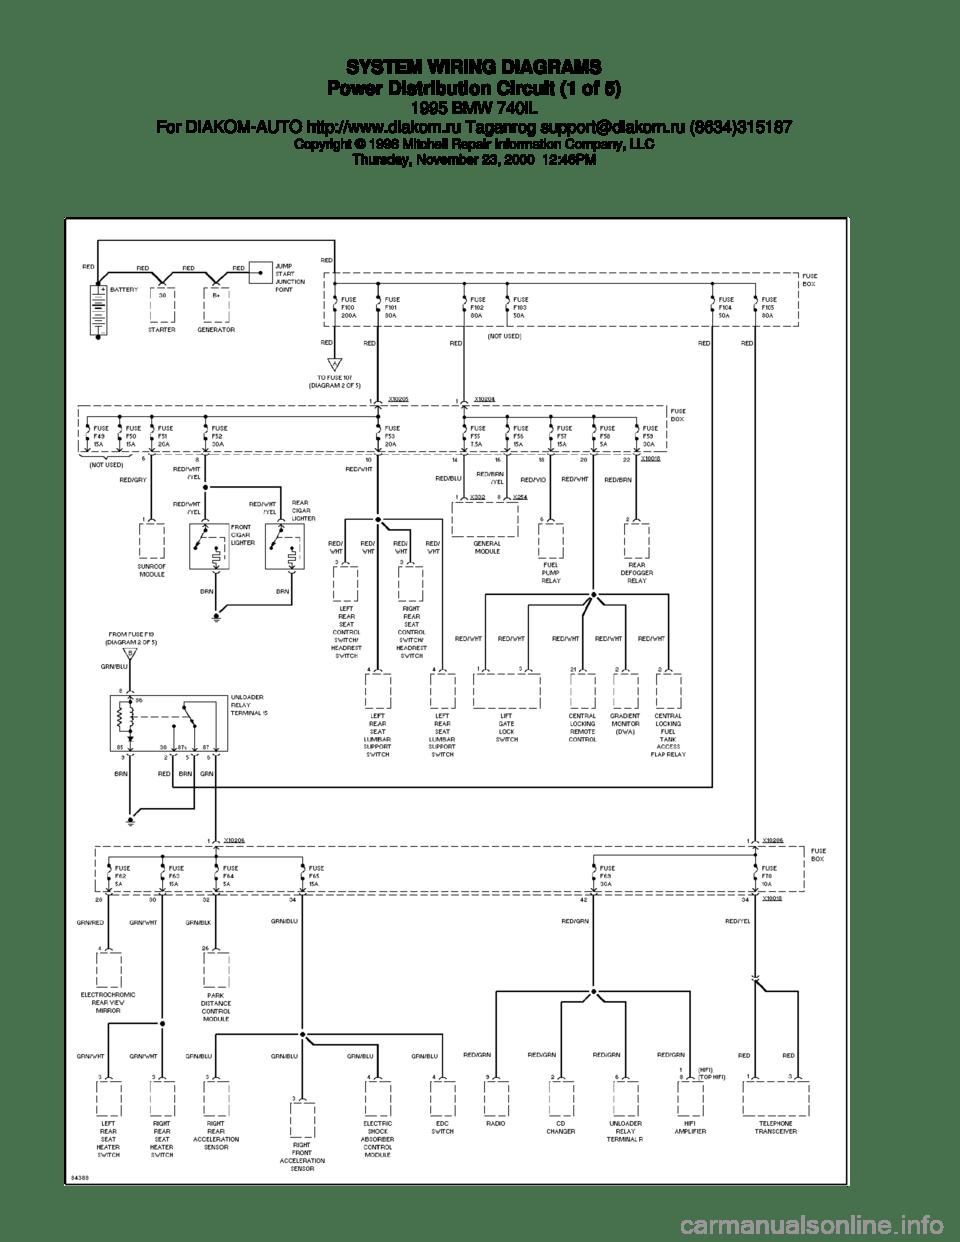 hight resolution of 1999 bluebird wiring diagram bluebird print wiring diagram 2000 bluebird bus wiring diagram 1999 bluebird bus wiring diagram